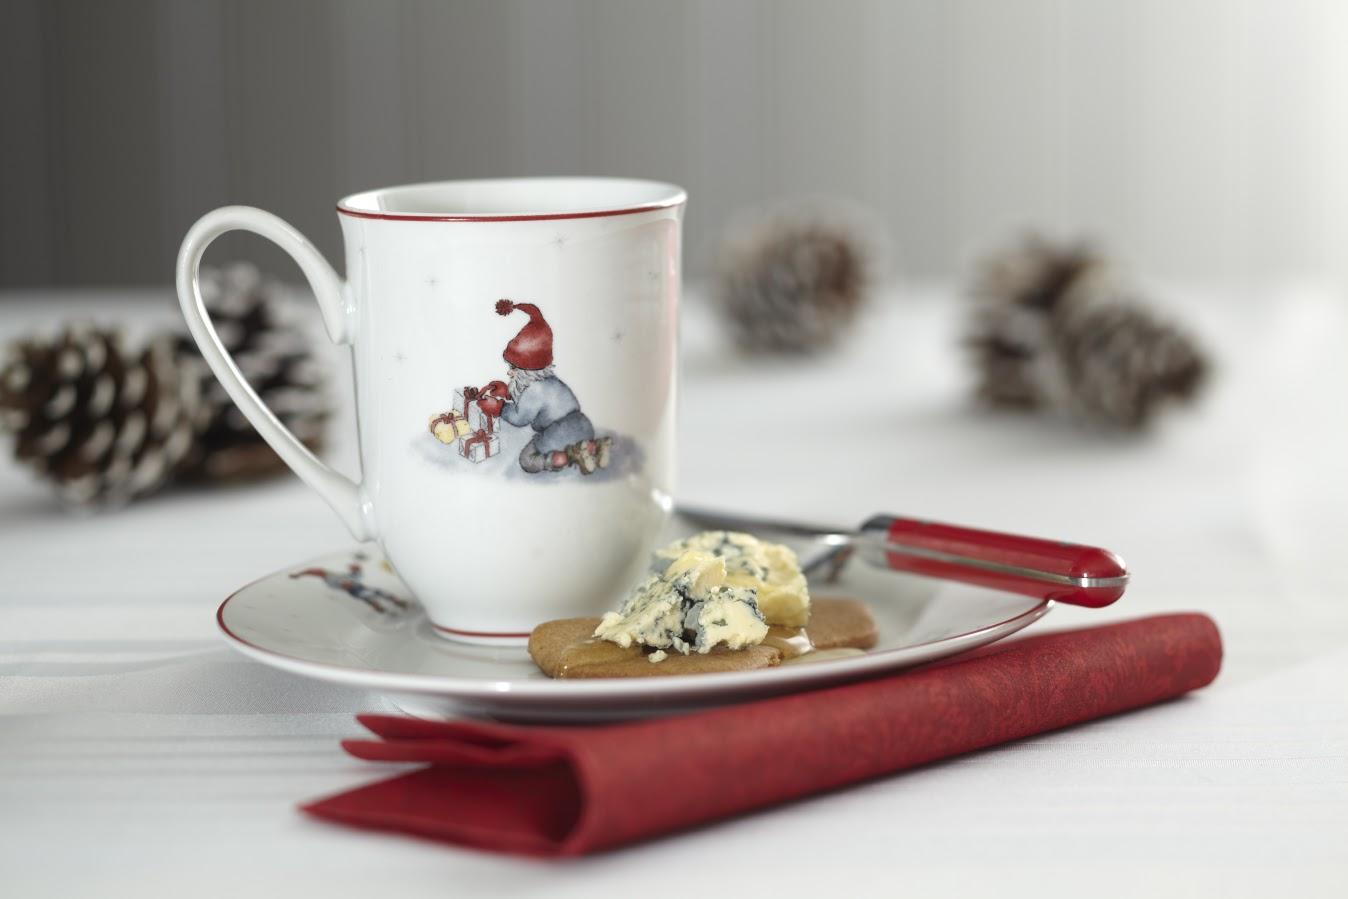 Helt nye Nille: Vi elsker deres juleservise-engasjement! UU-25